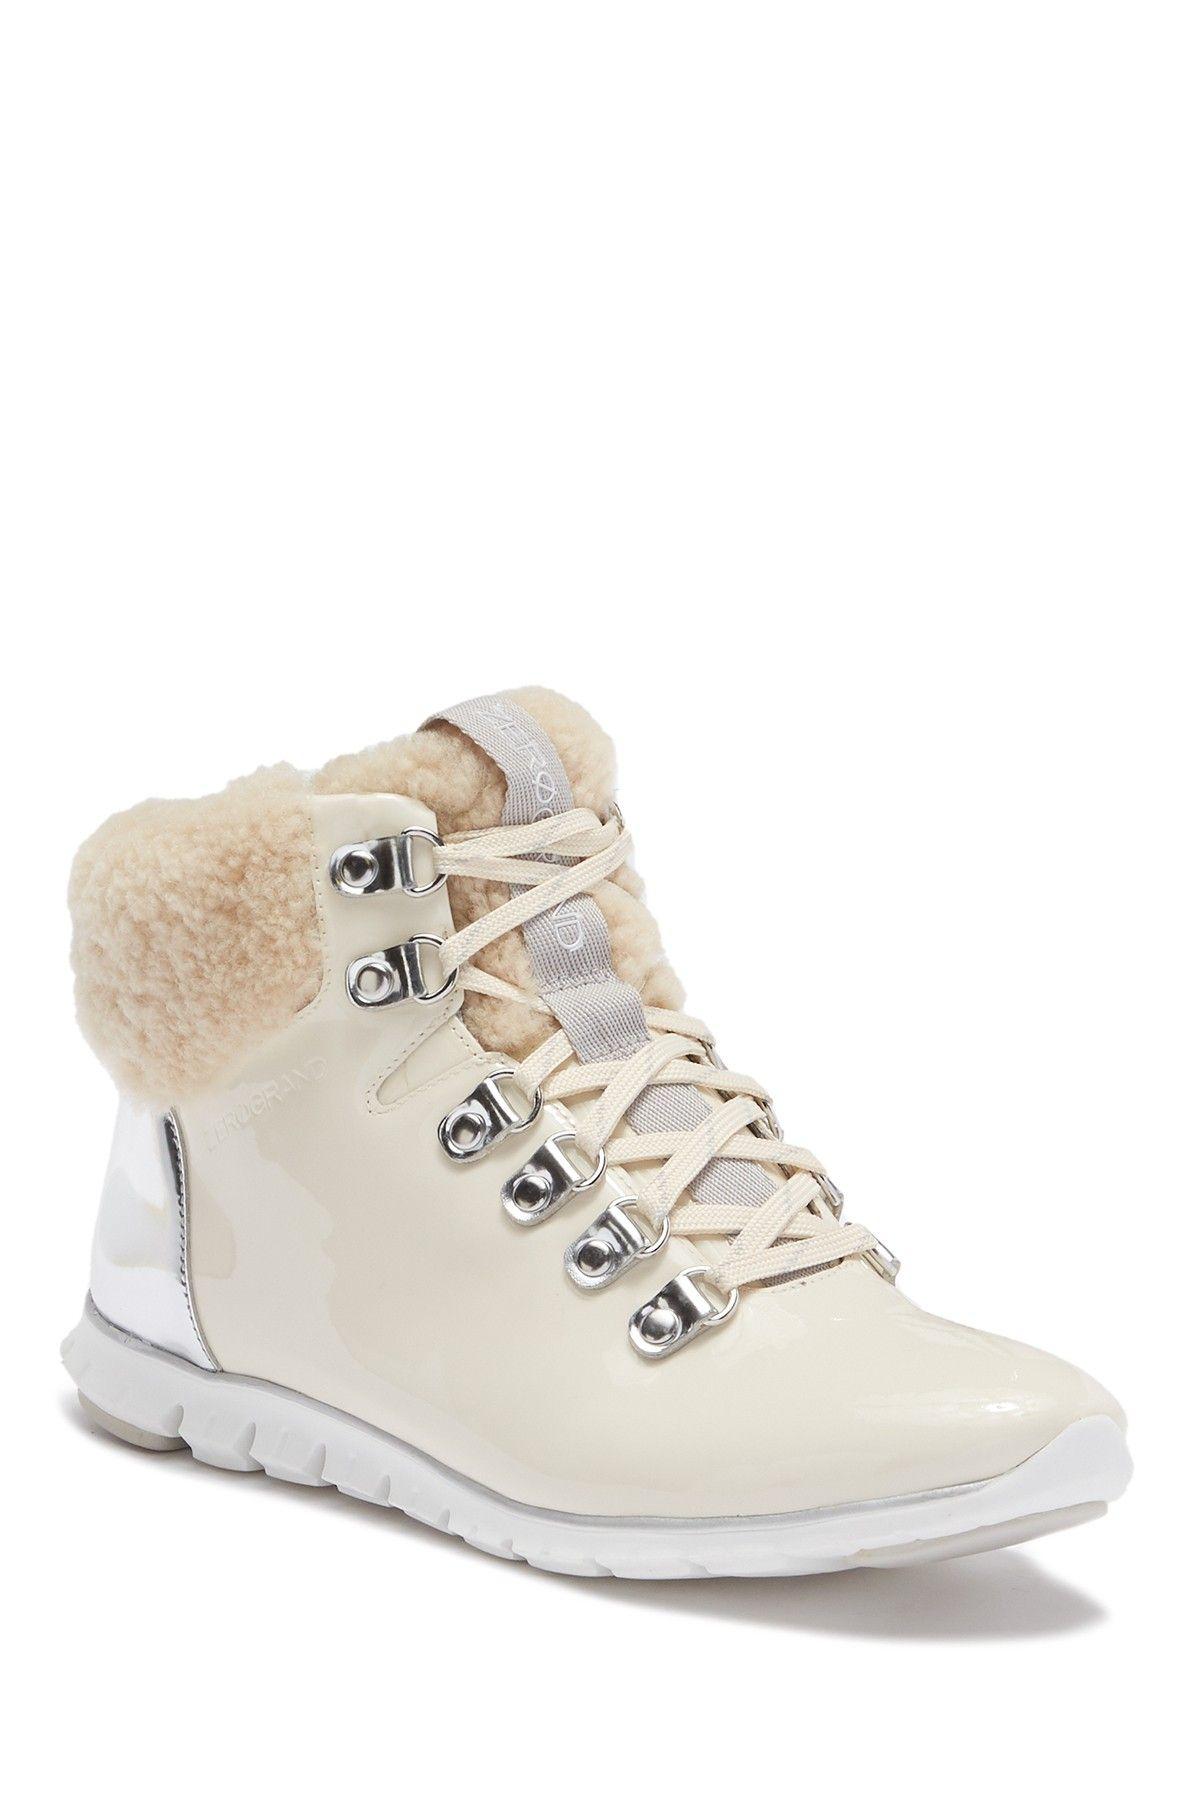 e53ba349ab1 Image of Cole Haan Zerogrand Genuine Shearling Waterproof Hiker Boot